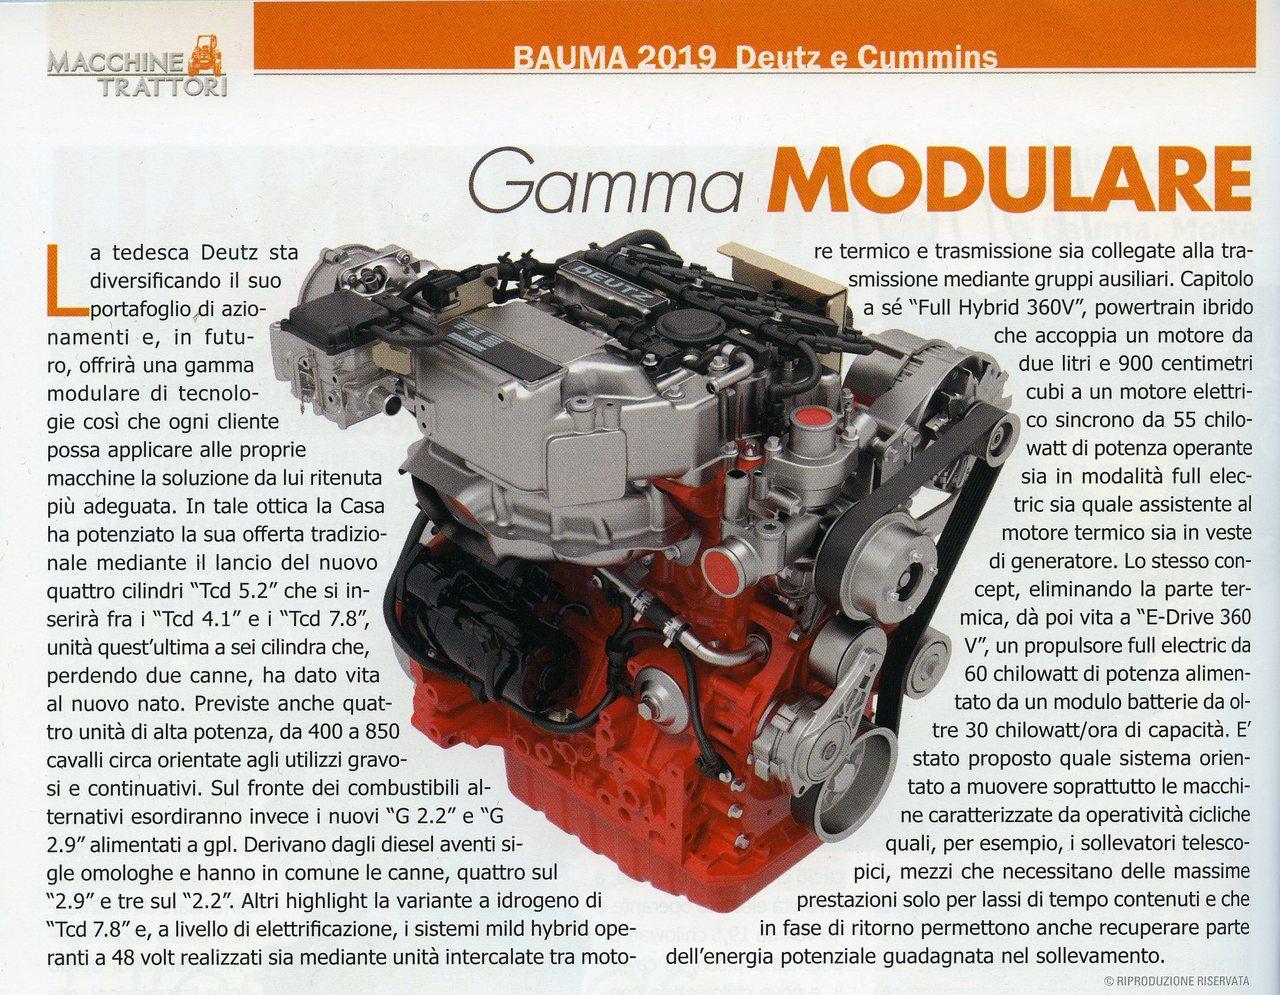 Gamma modulare